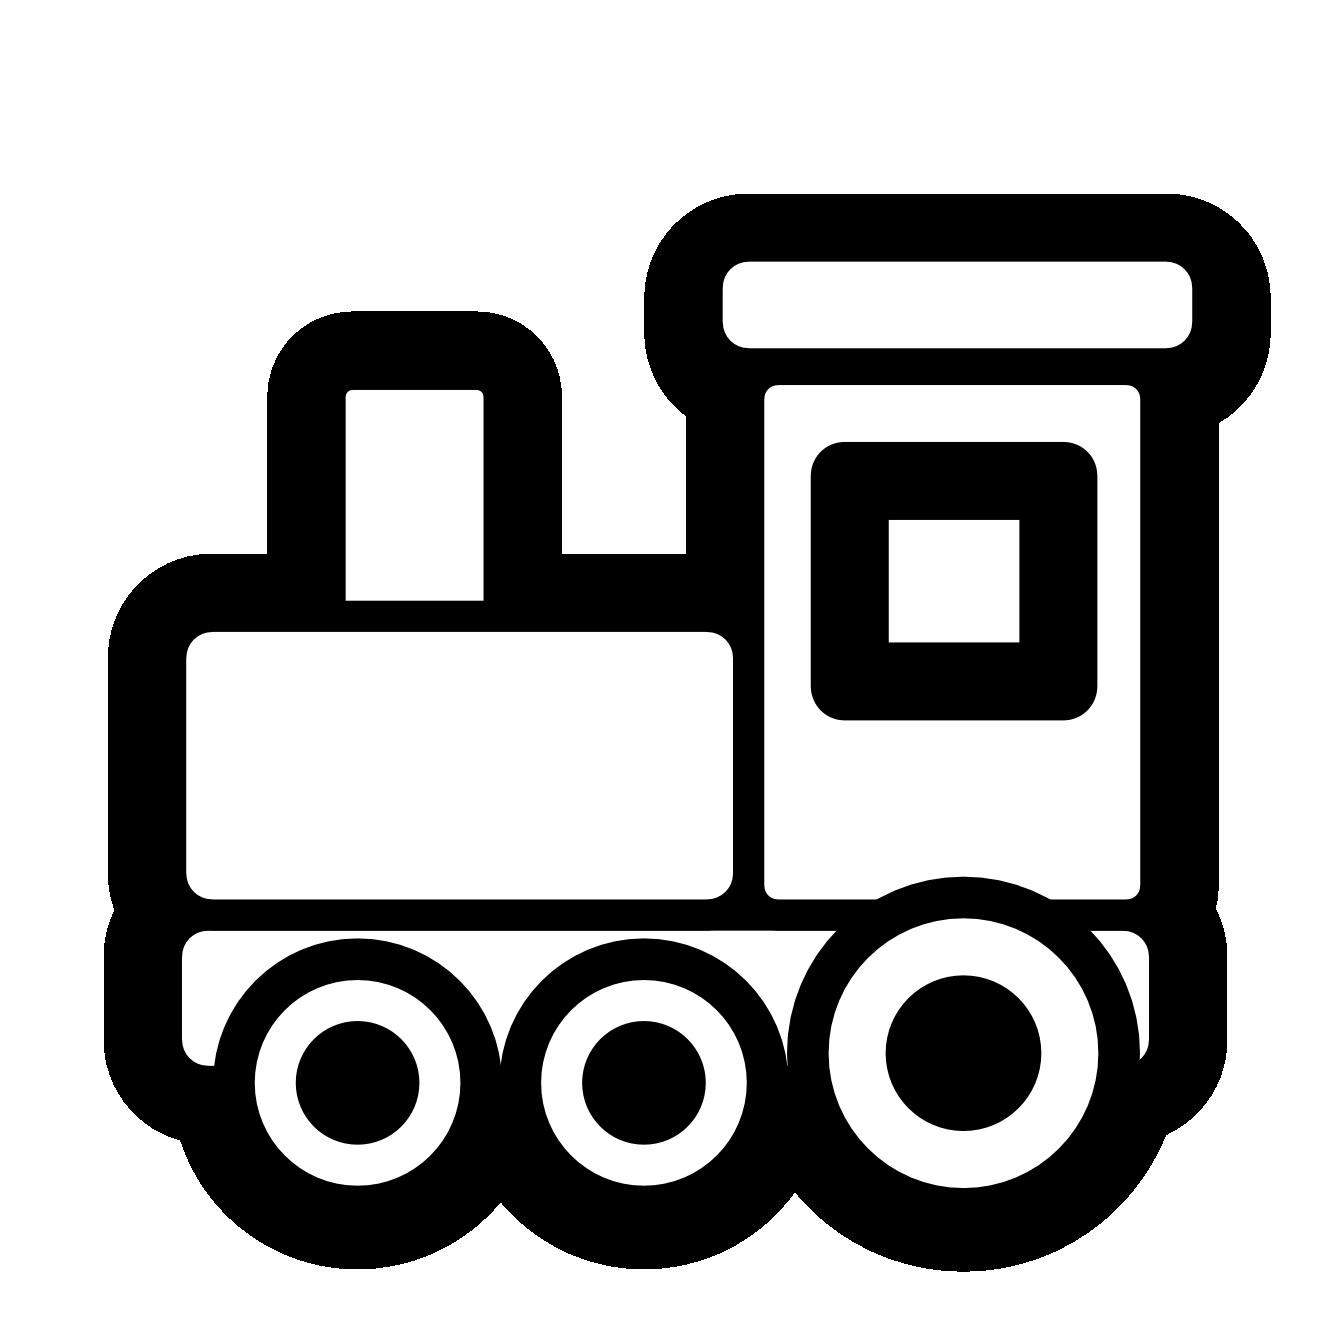 Circus clipart platform. Train black and white